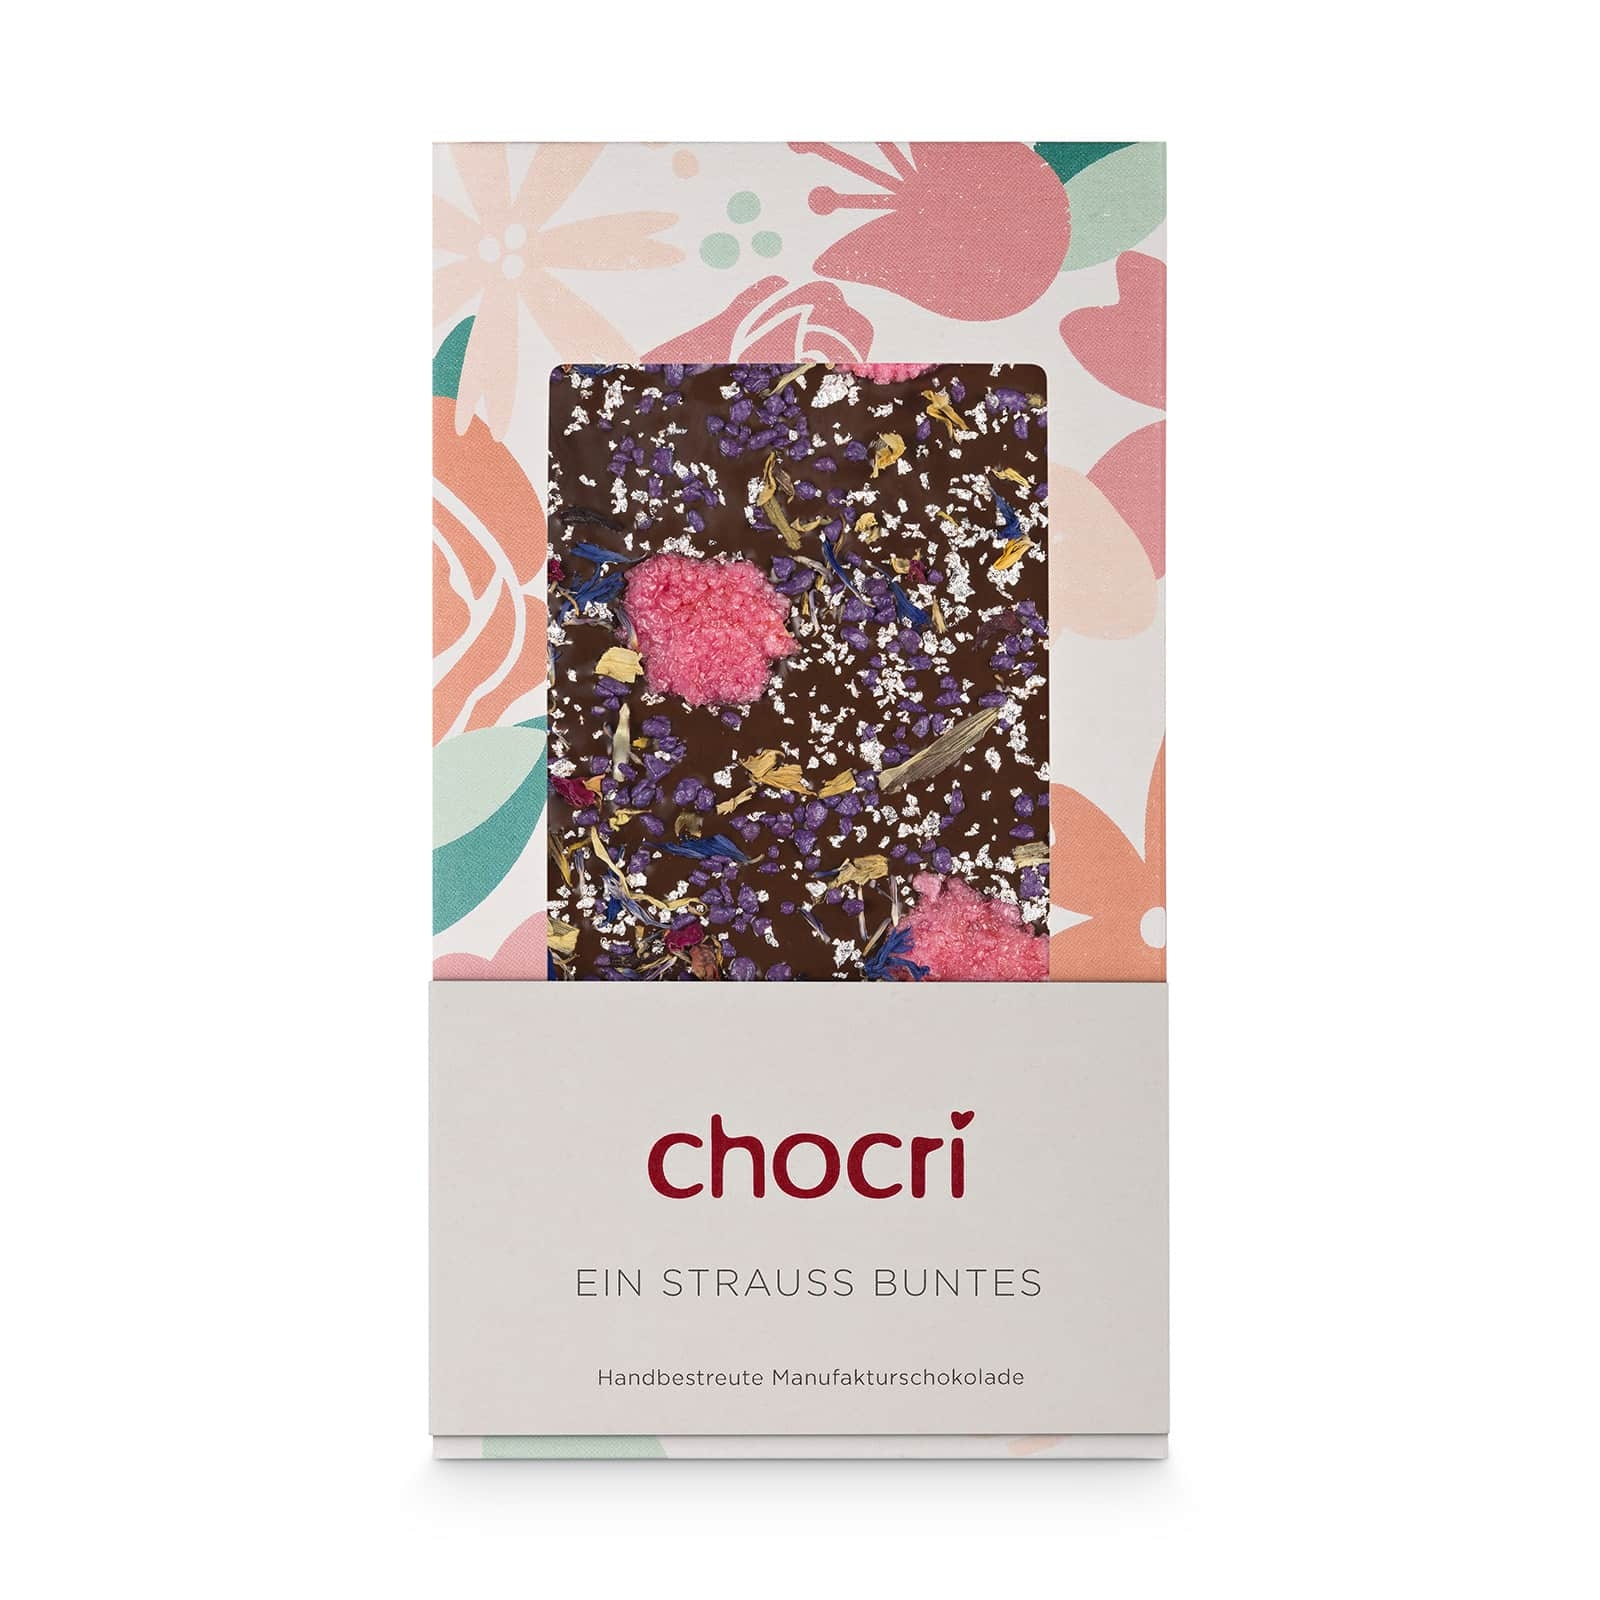 chocri 'Ein Strauß Buntes' Schokoladentafel